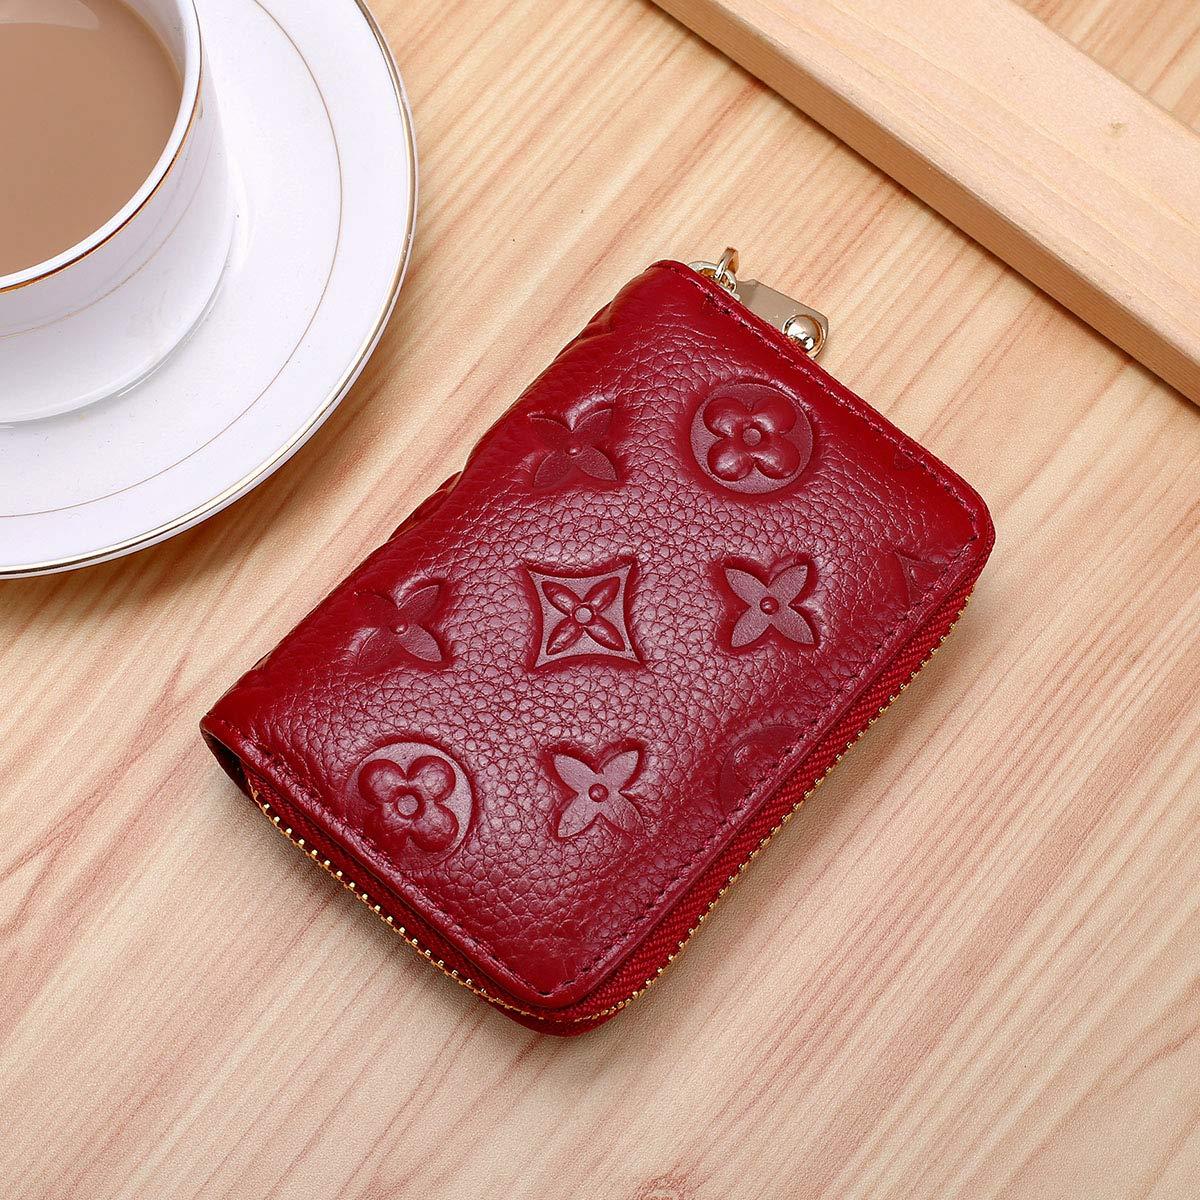 Auner Womens Wallet RFID Blocking Genuine Leather Multi Credit Card Holder Zipper Small Wallets - Dark Red by Auner (Image #2)